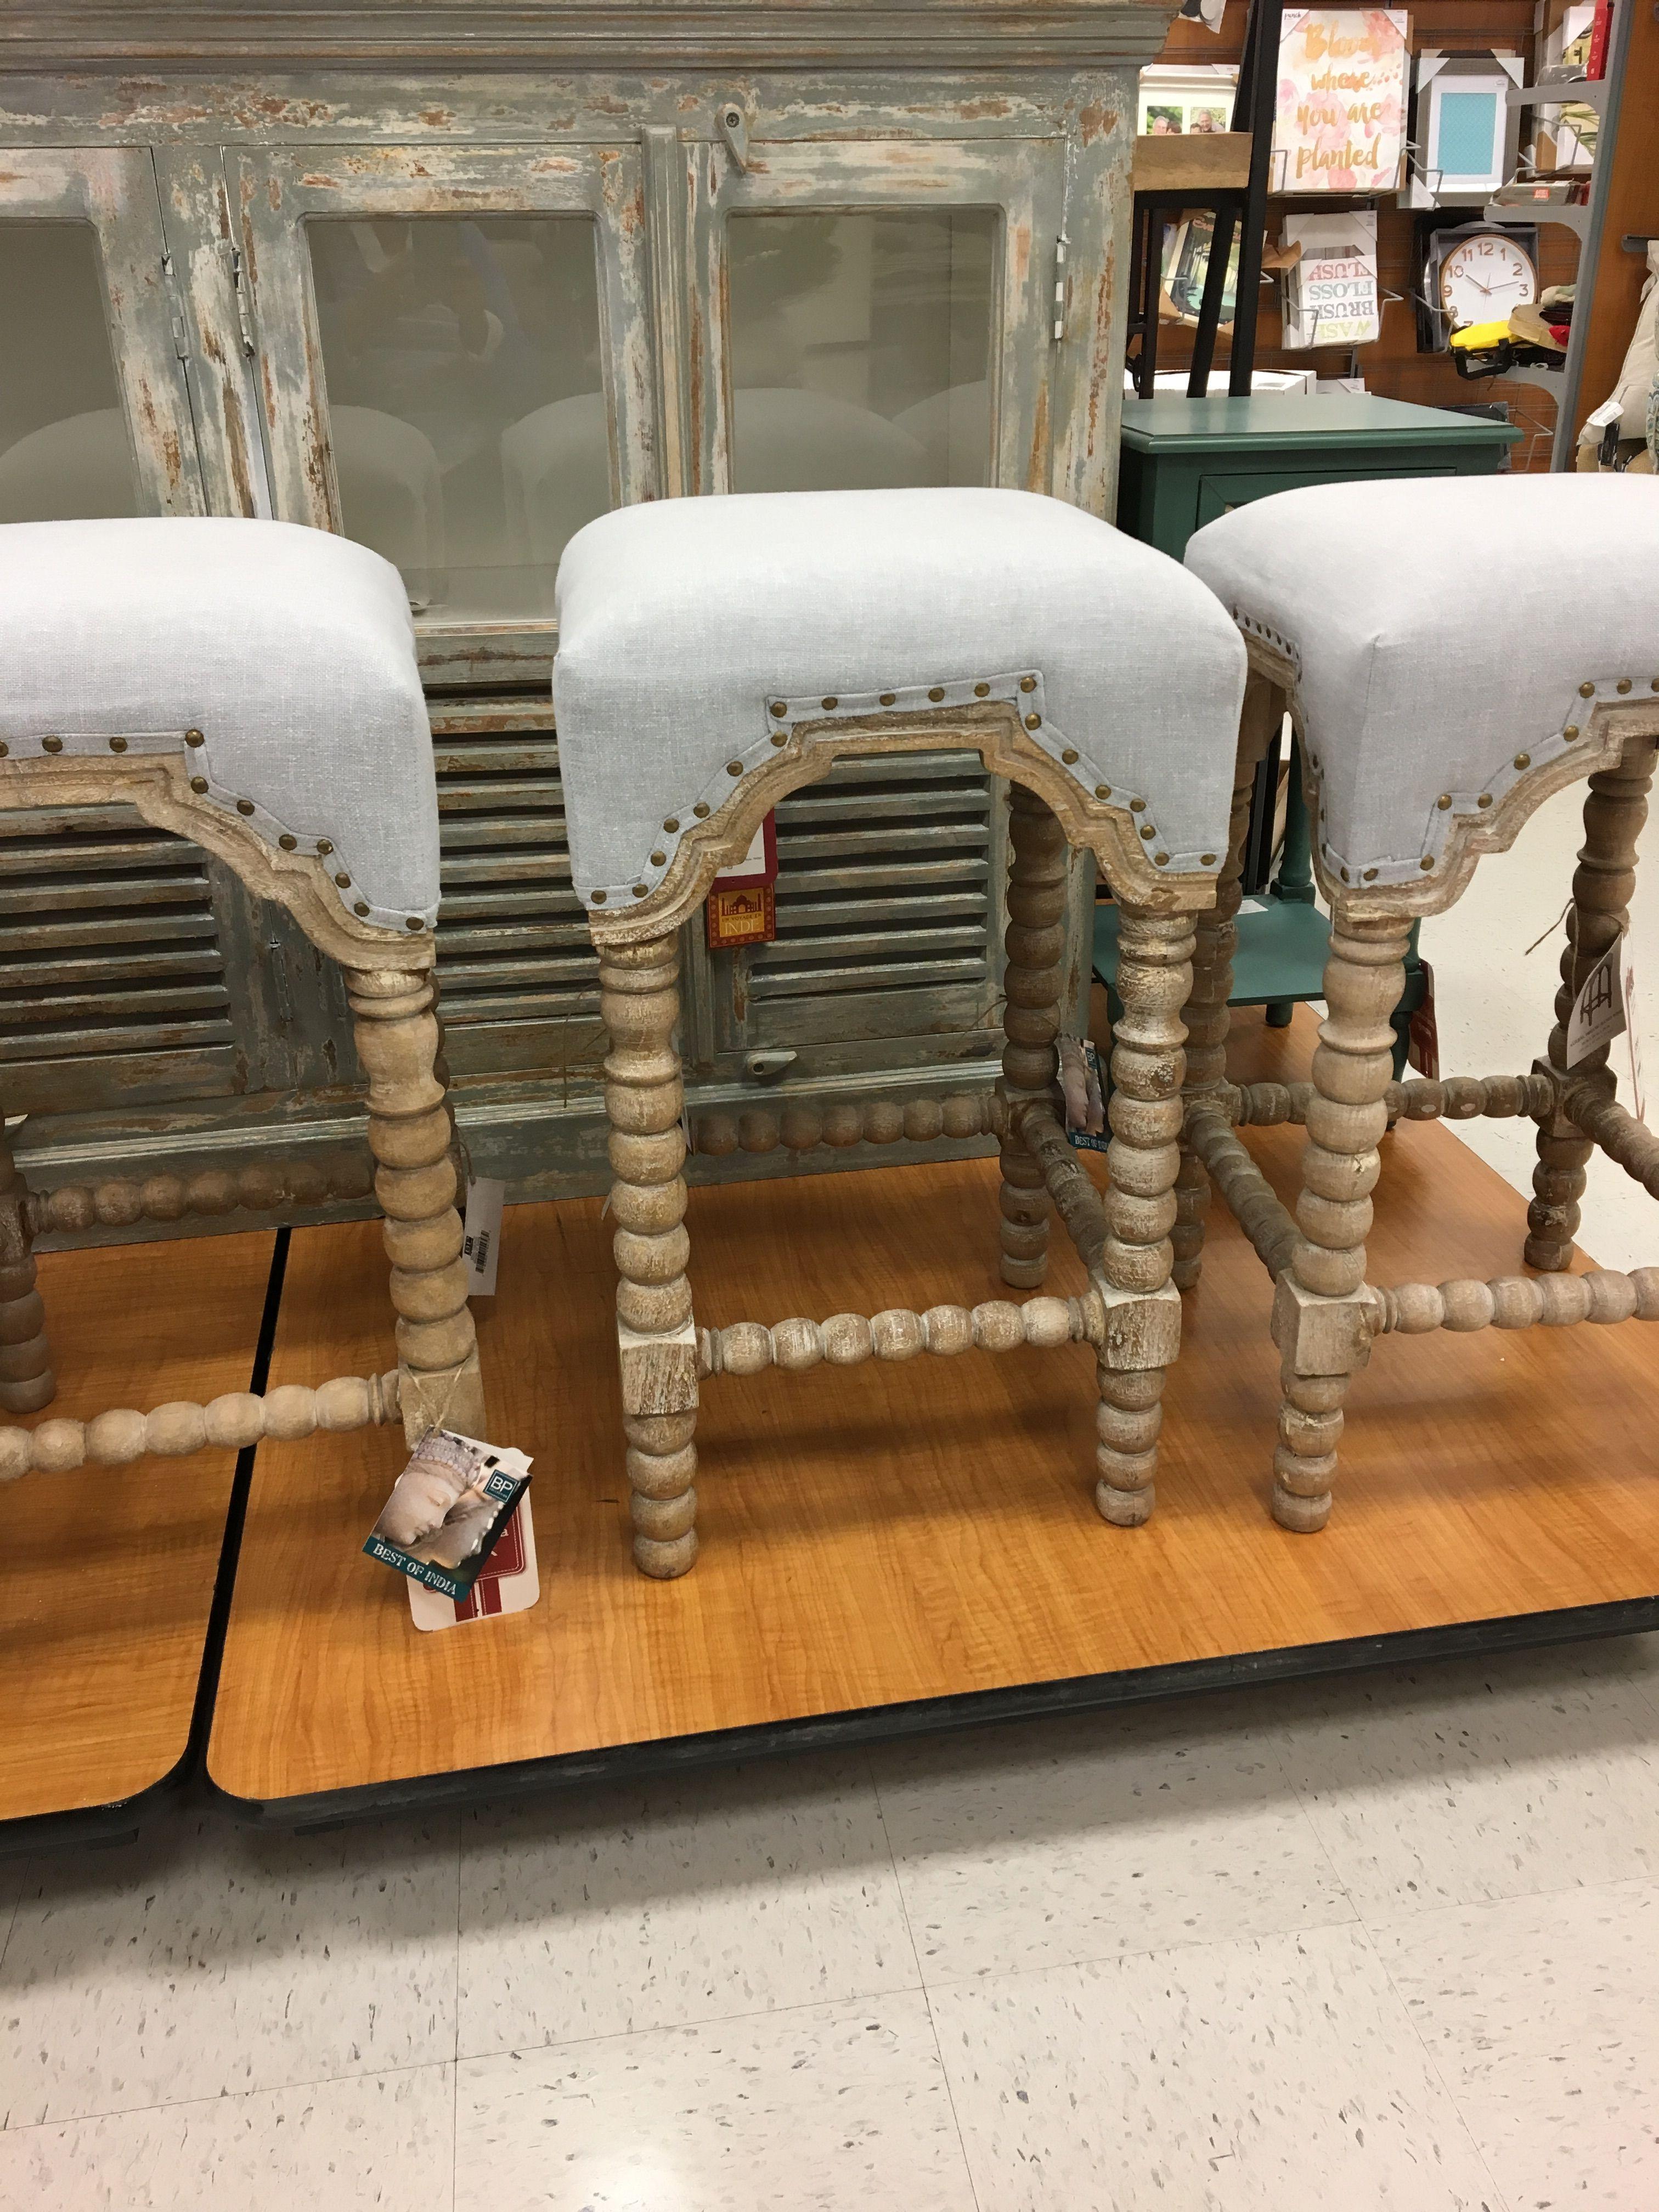 Found these pretty bar stools at TJ Maxx   Homegoods Store ... on marshalls shoes, marshalls wall art, marshalls new living room chairs, marshalls sofas, marshalls mirrors, marshalls online shopping, marshalls tj table lamp,